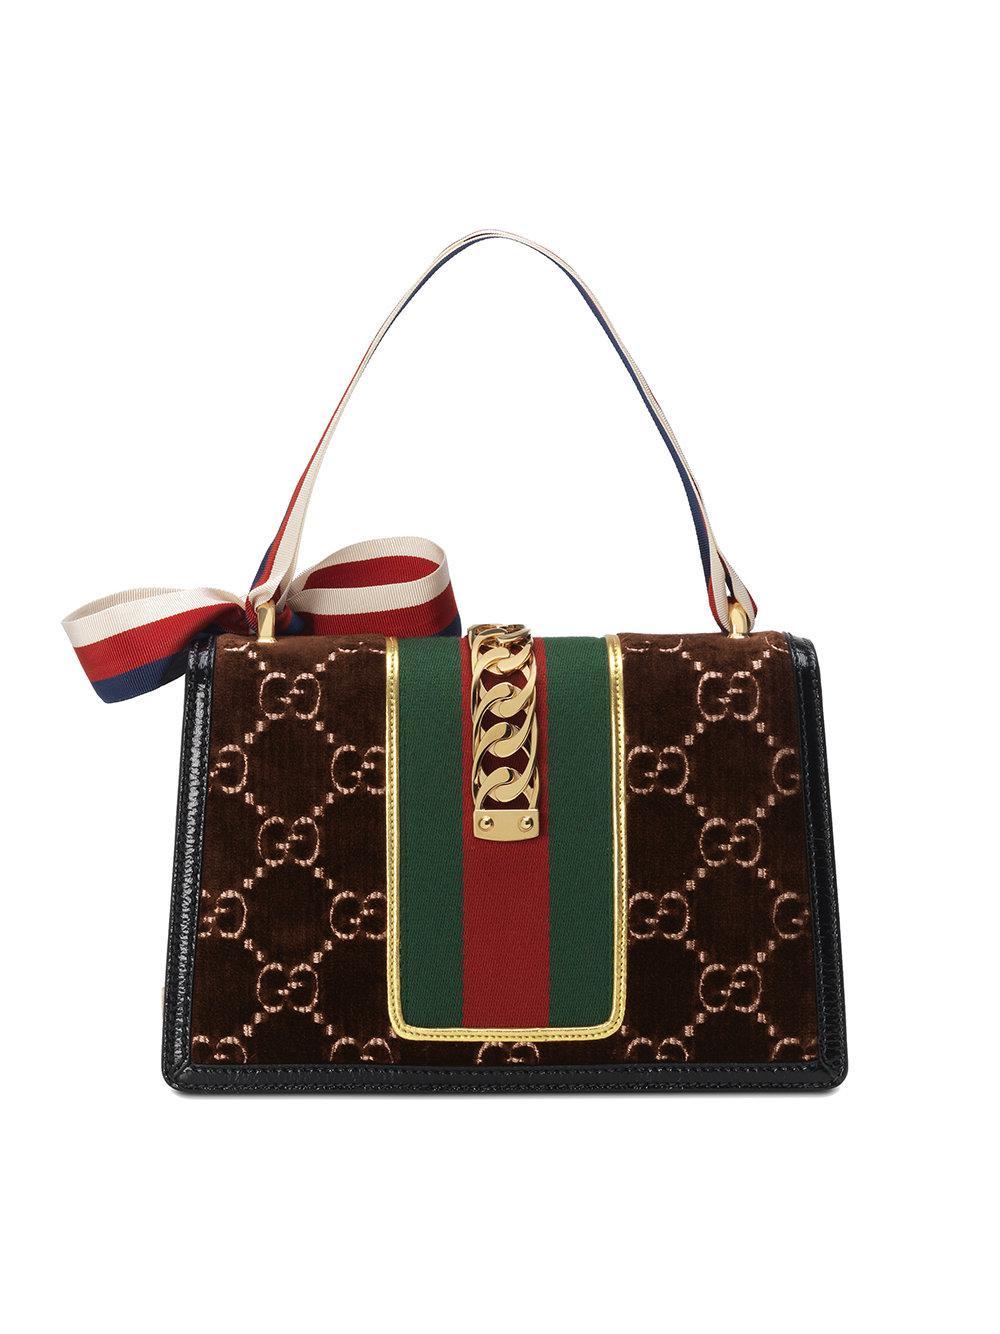 Sylvie GG velvet small shoulder bag - Brown Gucci gHNAsnGyJW